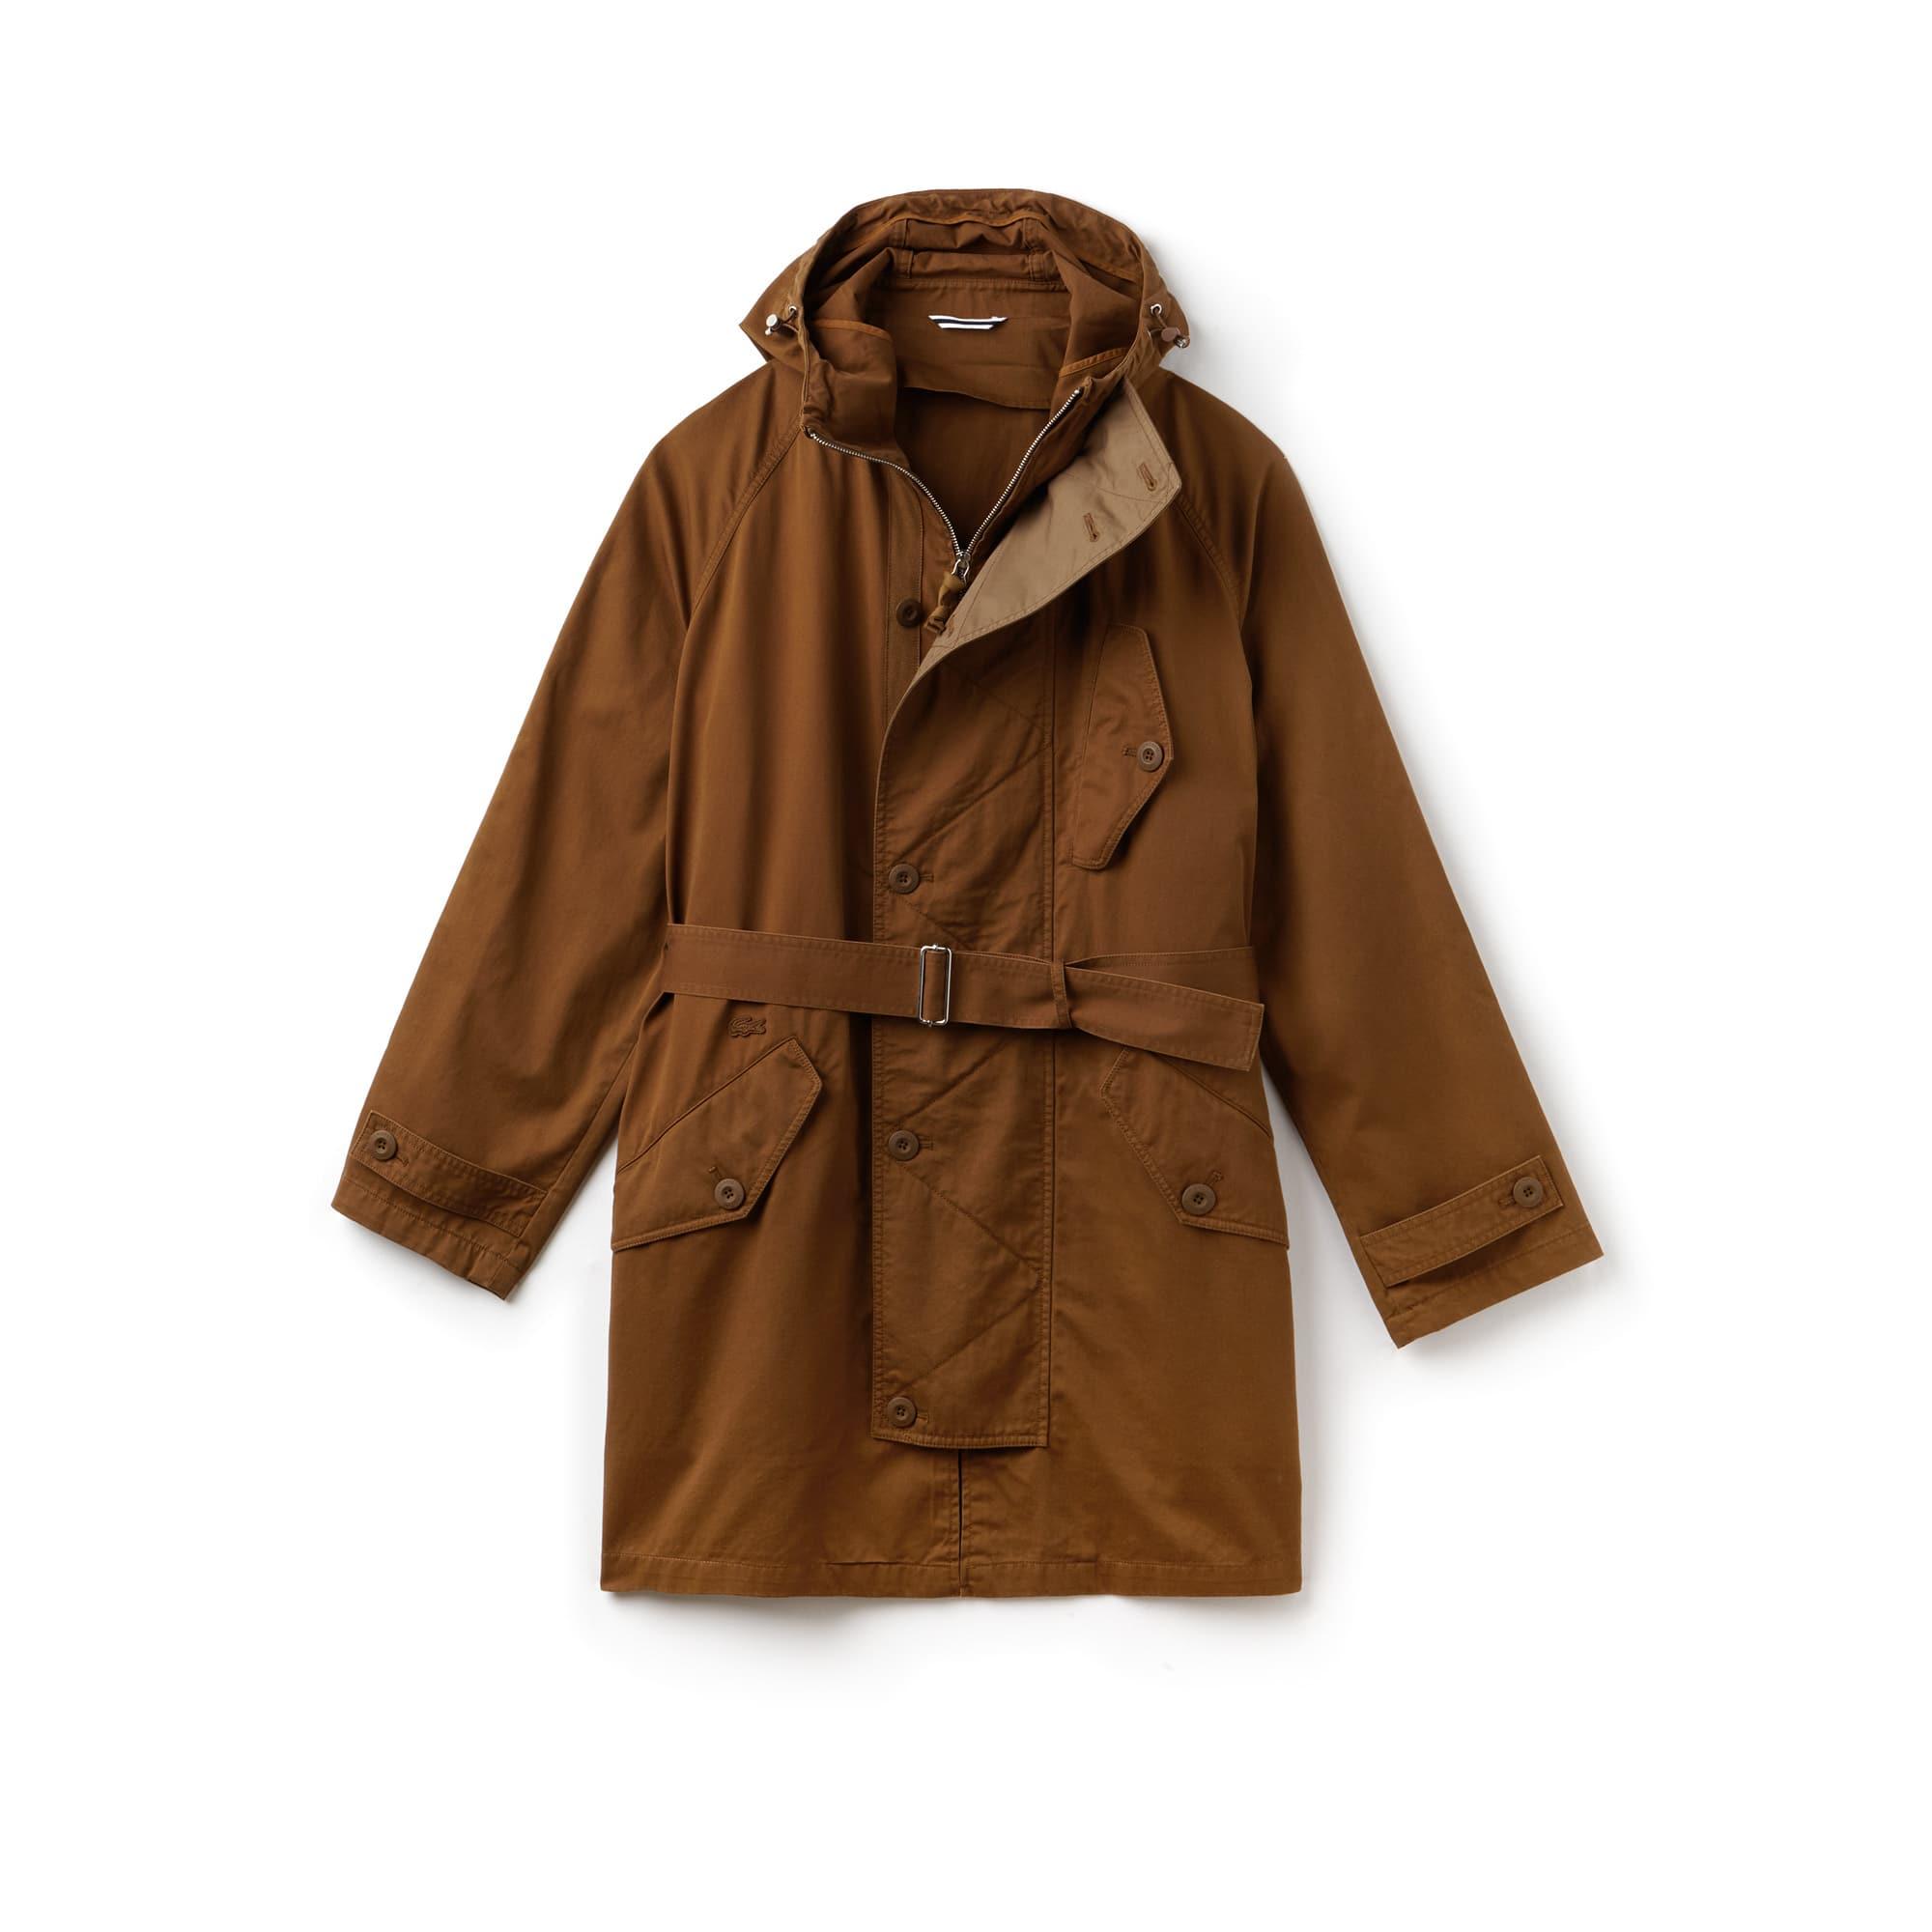 Men's Hooded Oversized Cotton Twill Parka